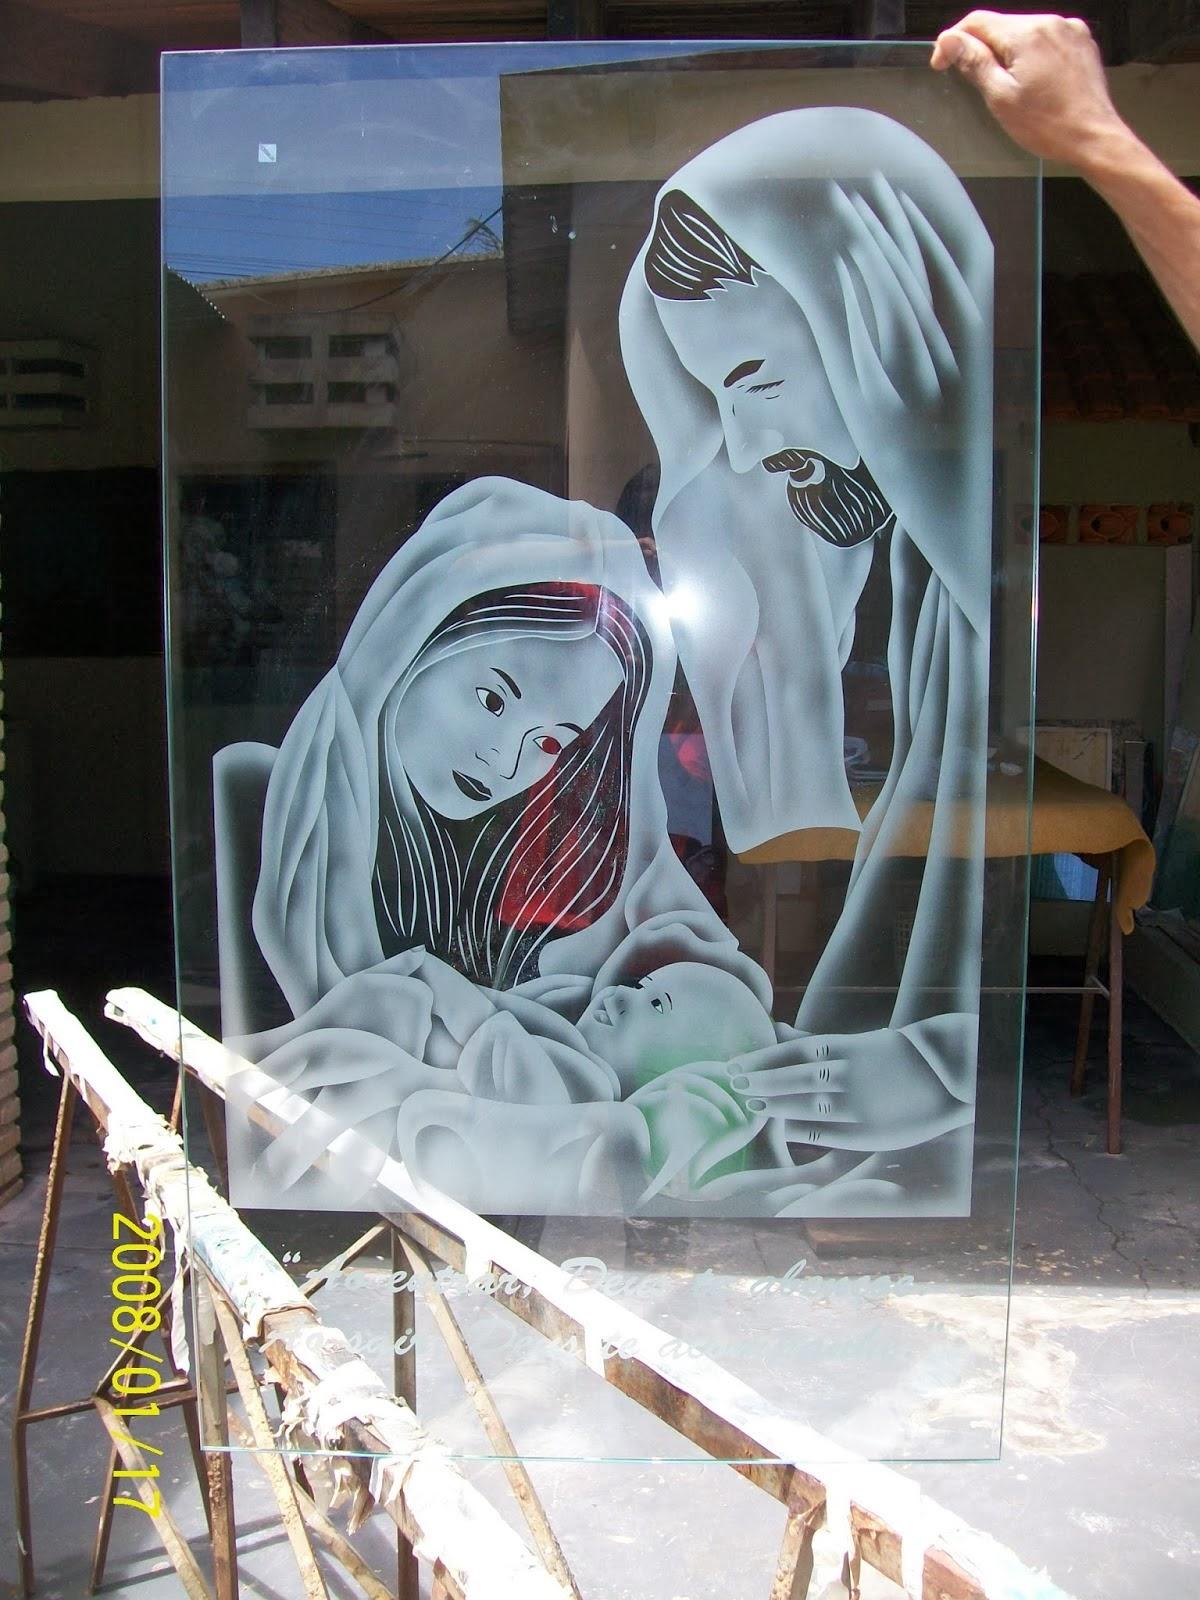 Imagens de #865C45 Jato Artes MS 1200x1600 px 3164 Box Banheiro Acrilico Campo Grande Ms